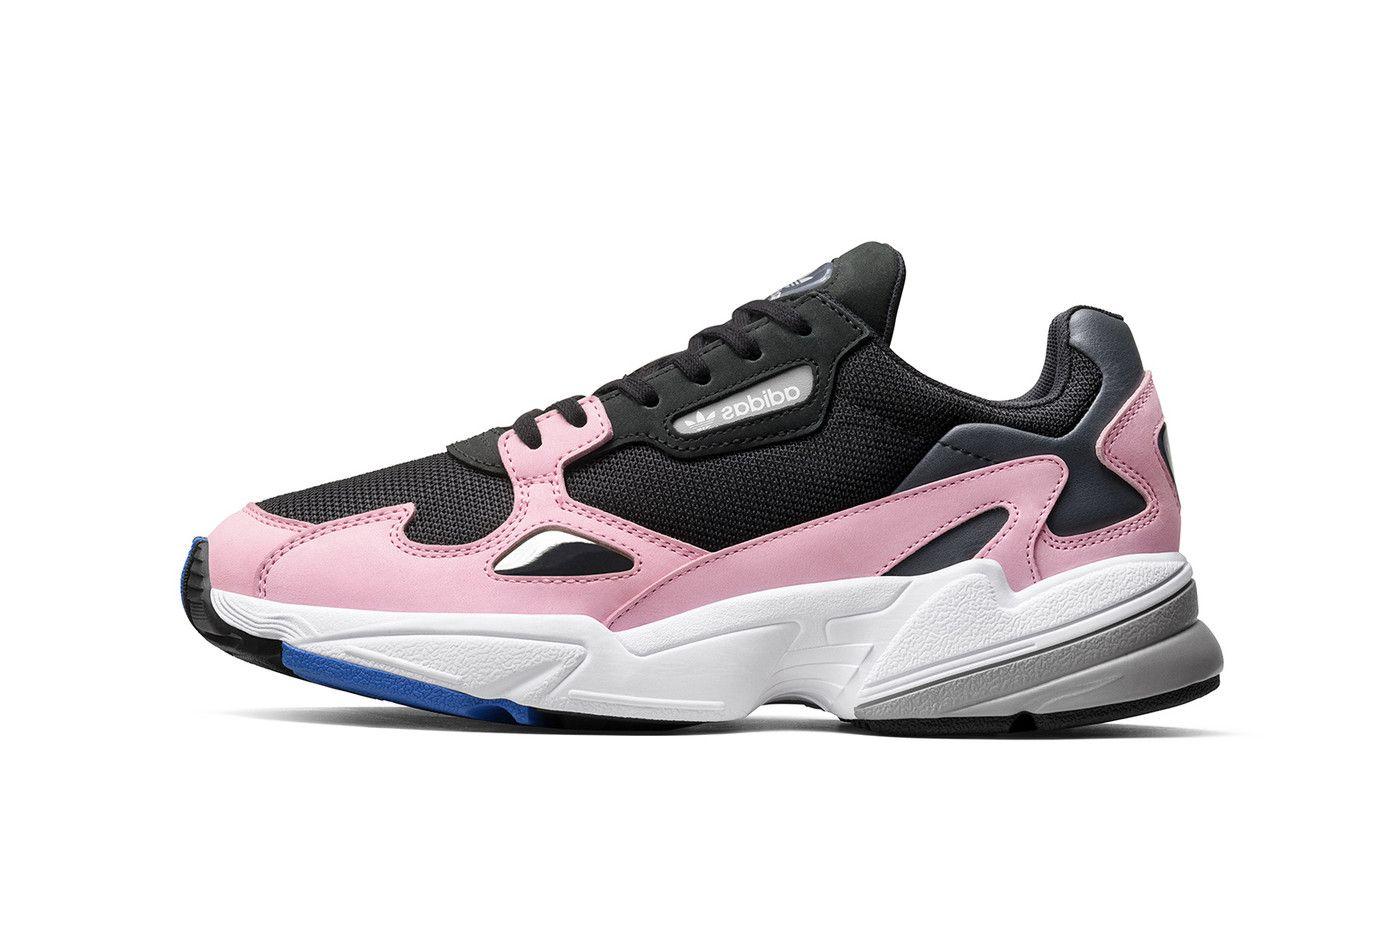 adidas Originals Falcon Dorf Runner Pink First Look | HYPEBEAST